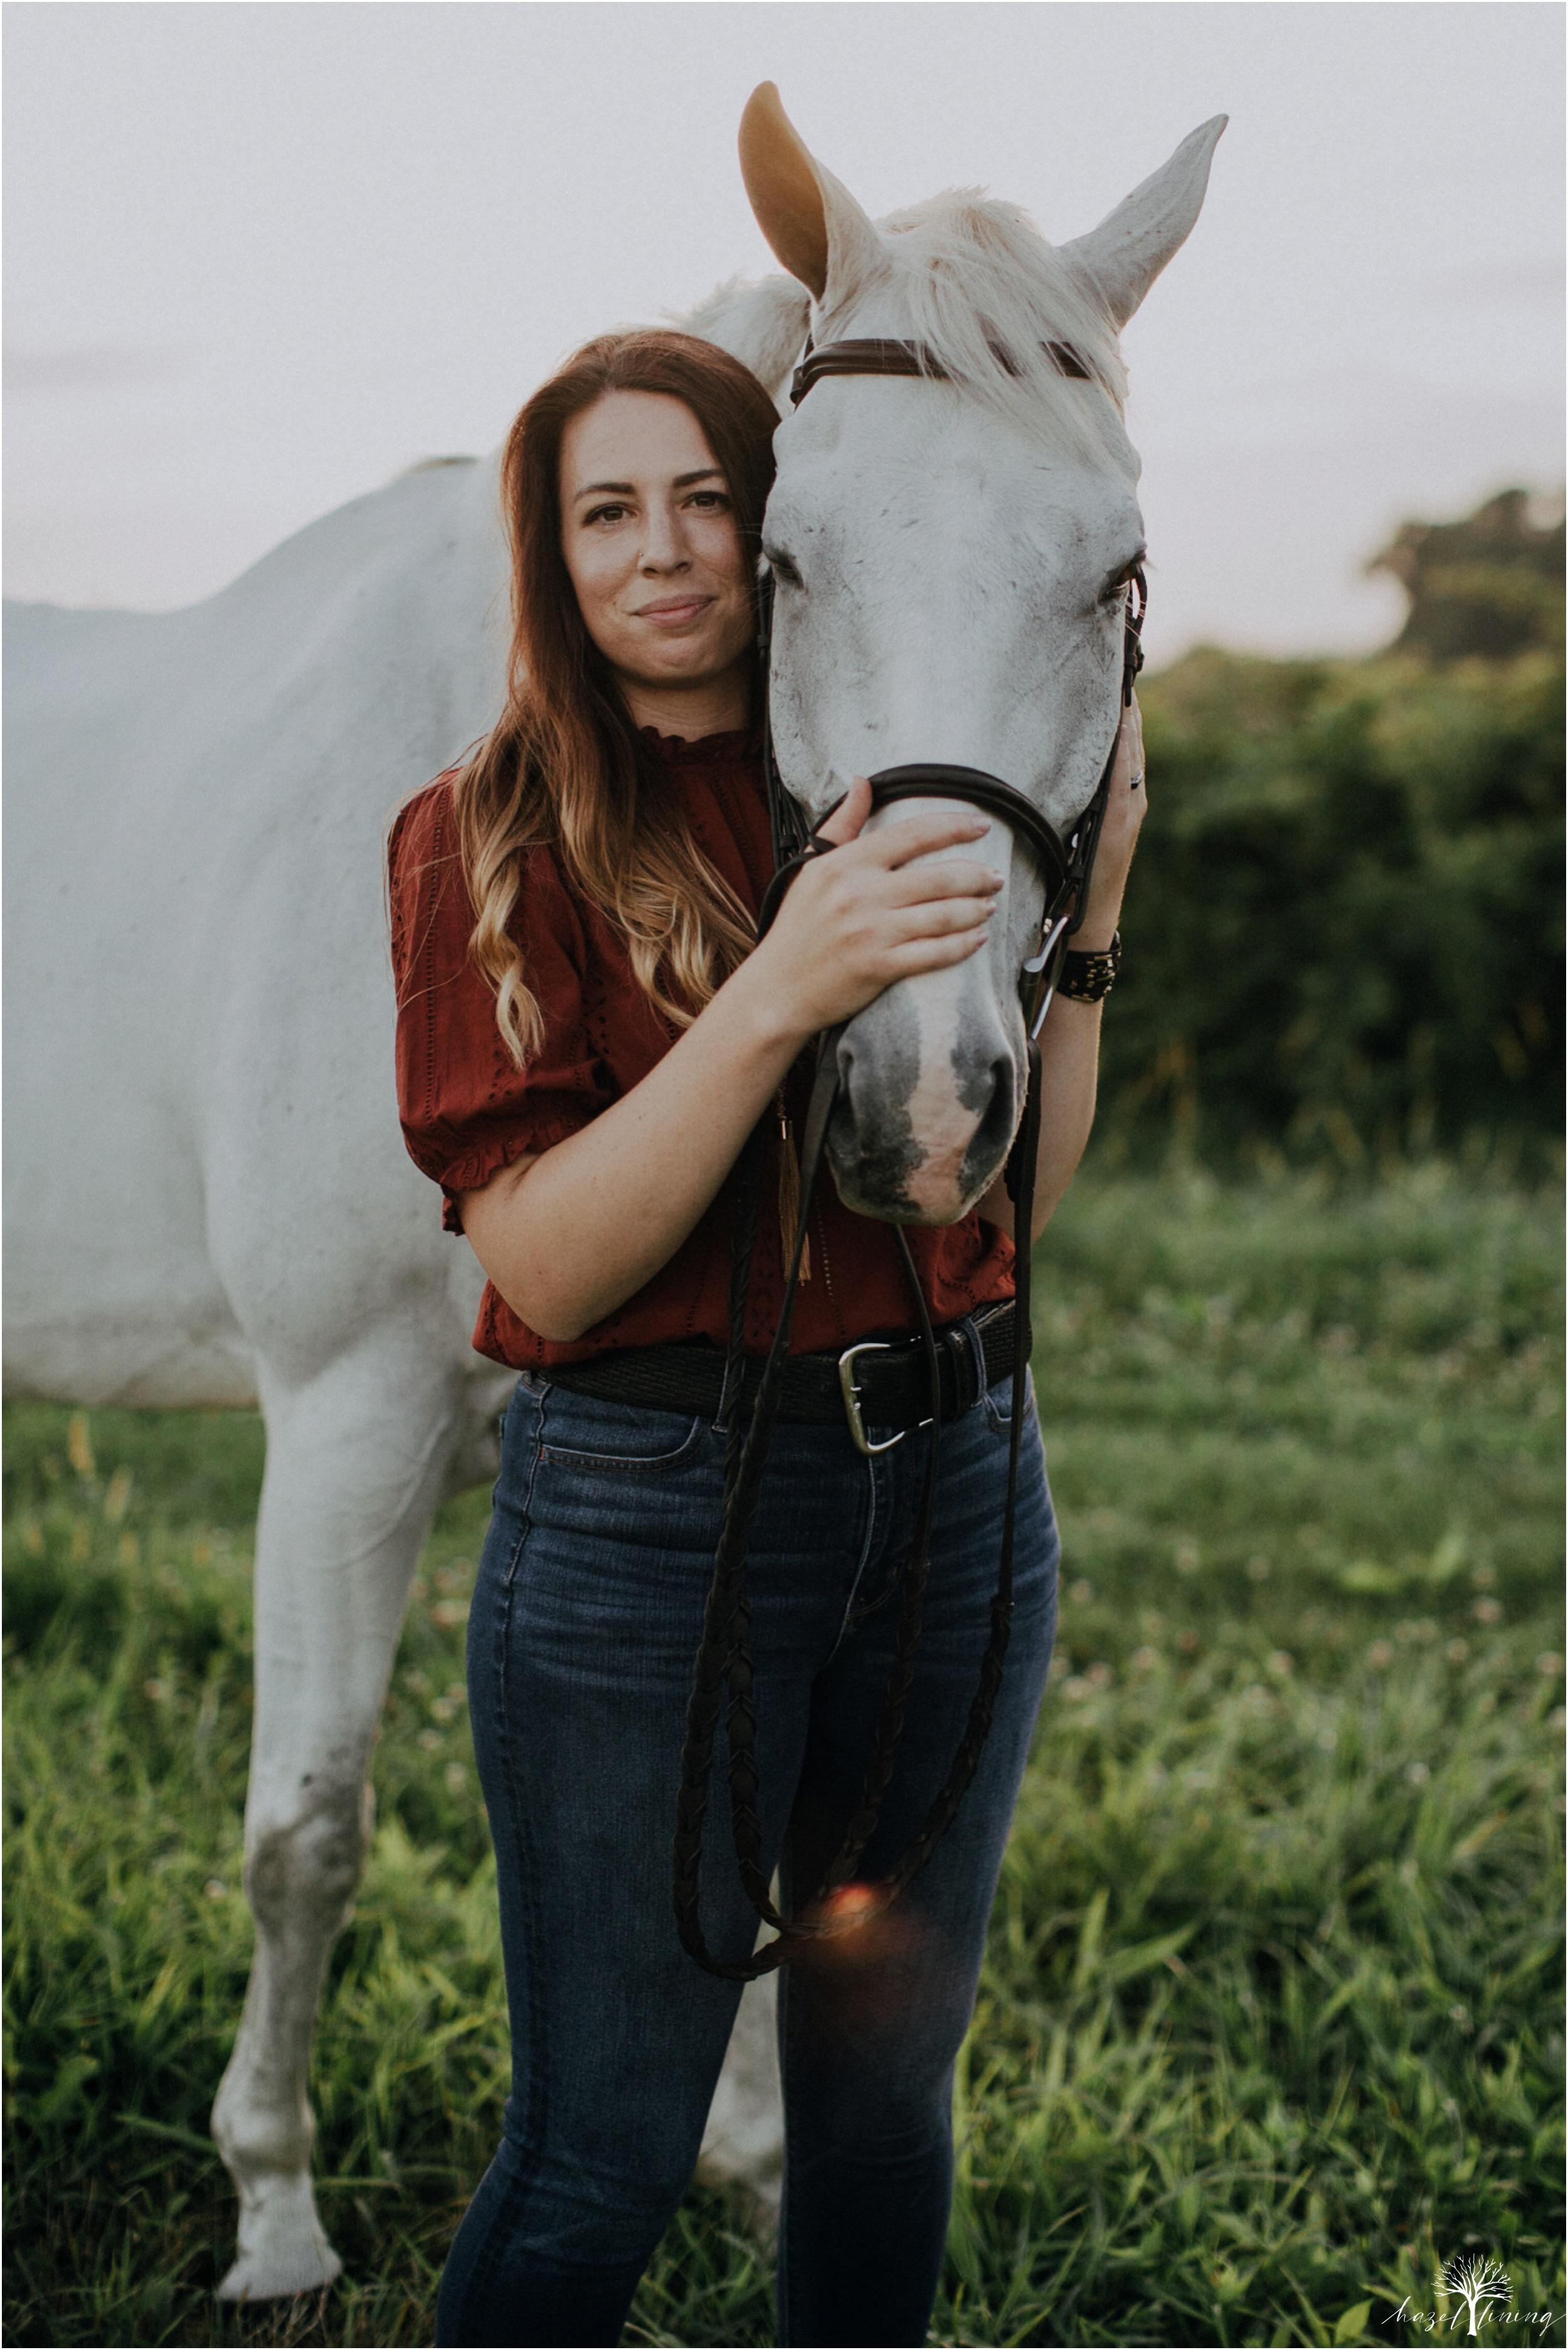 taylor-adams-and-horse-delaware-valley-university-delval-summer-equestrian-portrait-session-hazel-lining-photography-destination-elopement-wedding-engagement-photography_0032.jpg